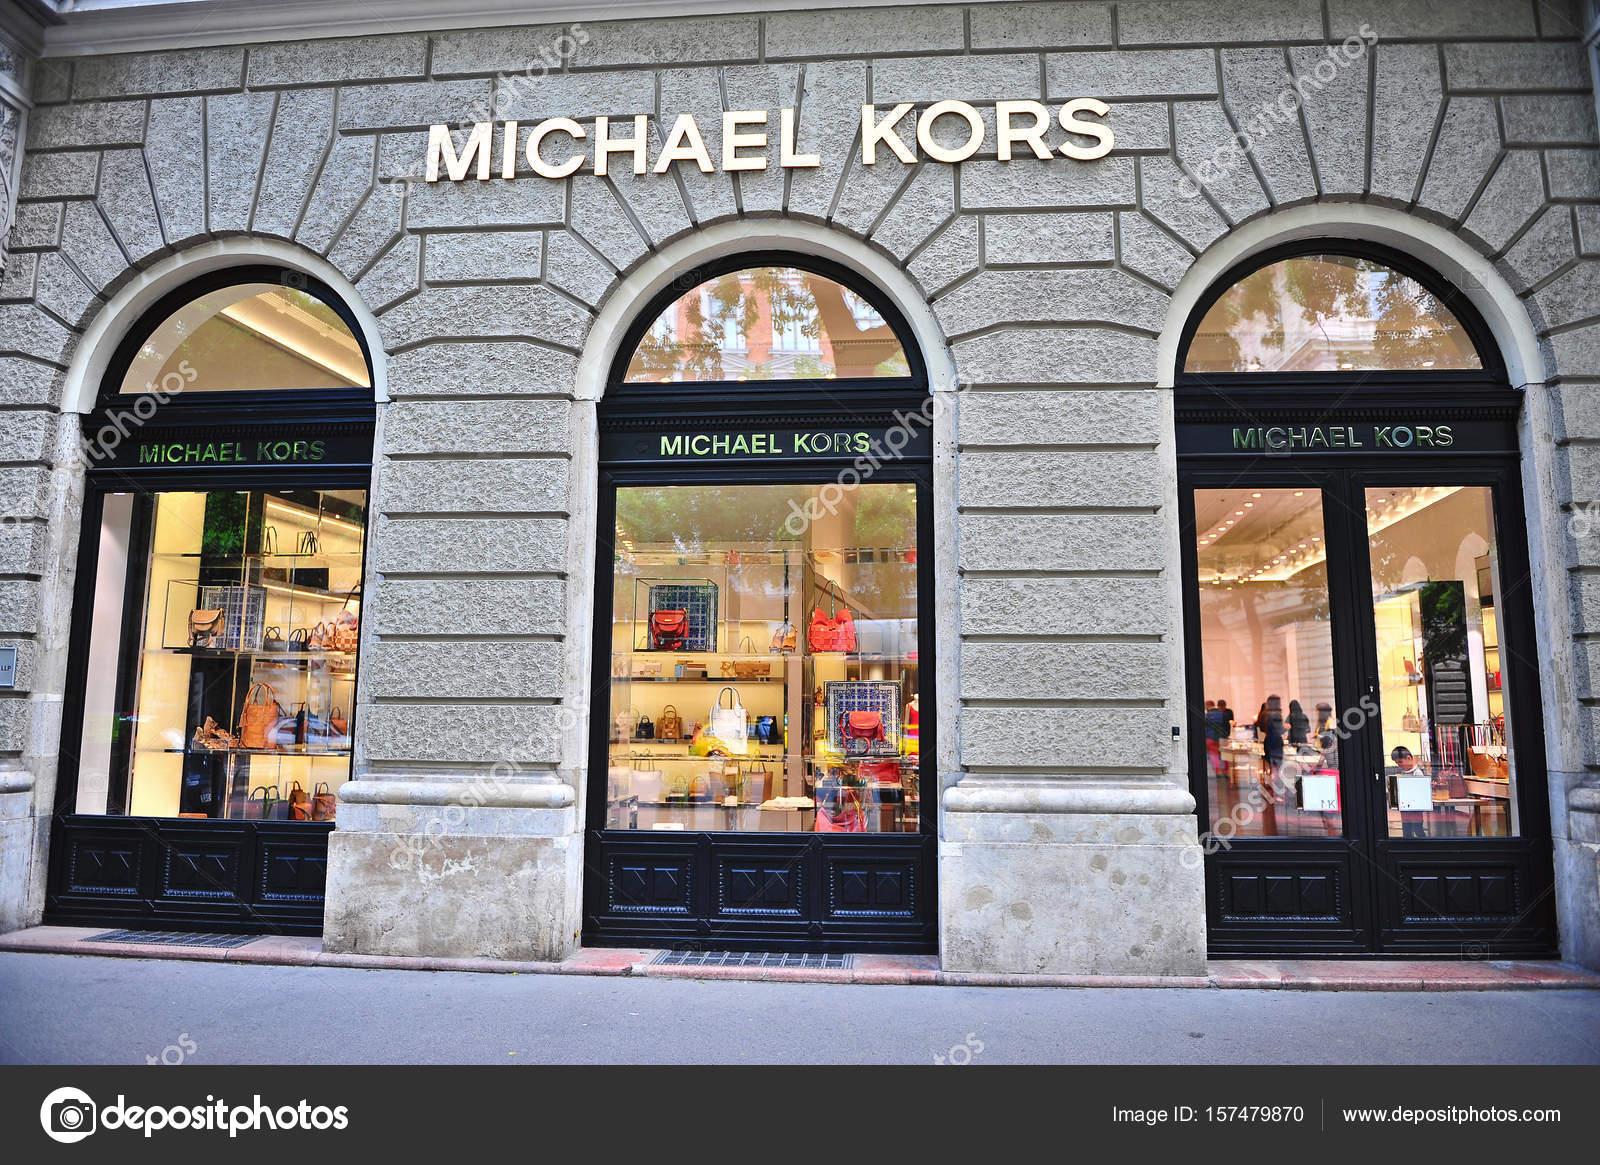 4bfc8634f7c23 Fachada da loja na rua Michael Kors — Fotografia de Stock Editorial ...